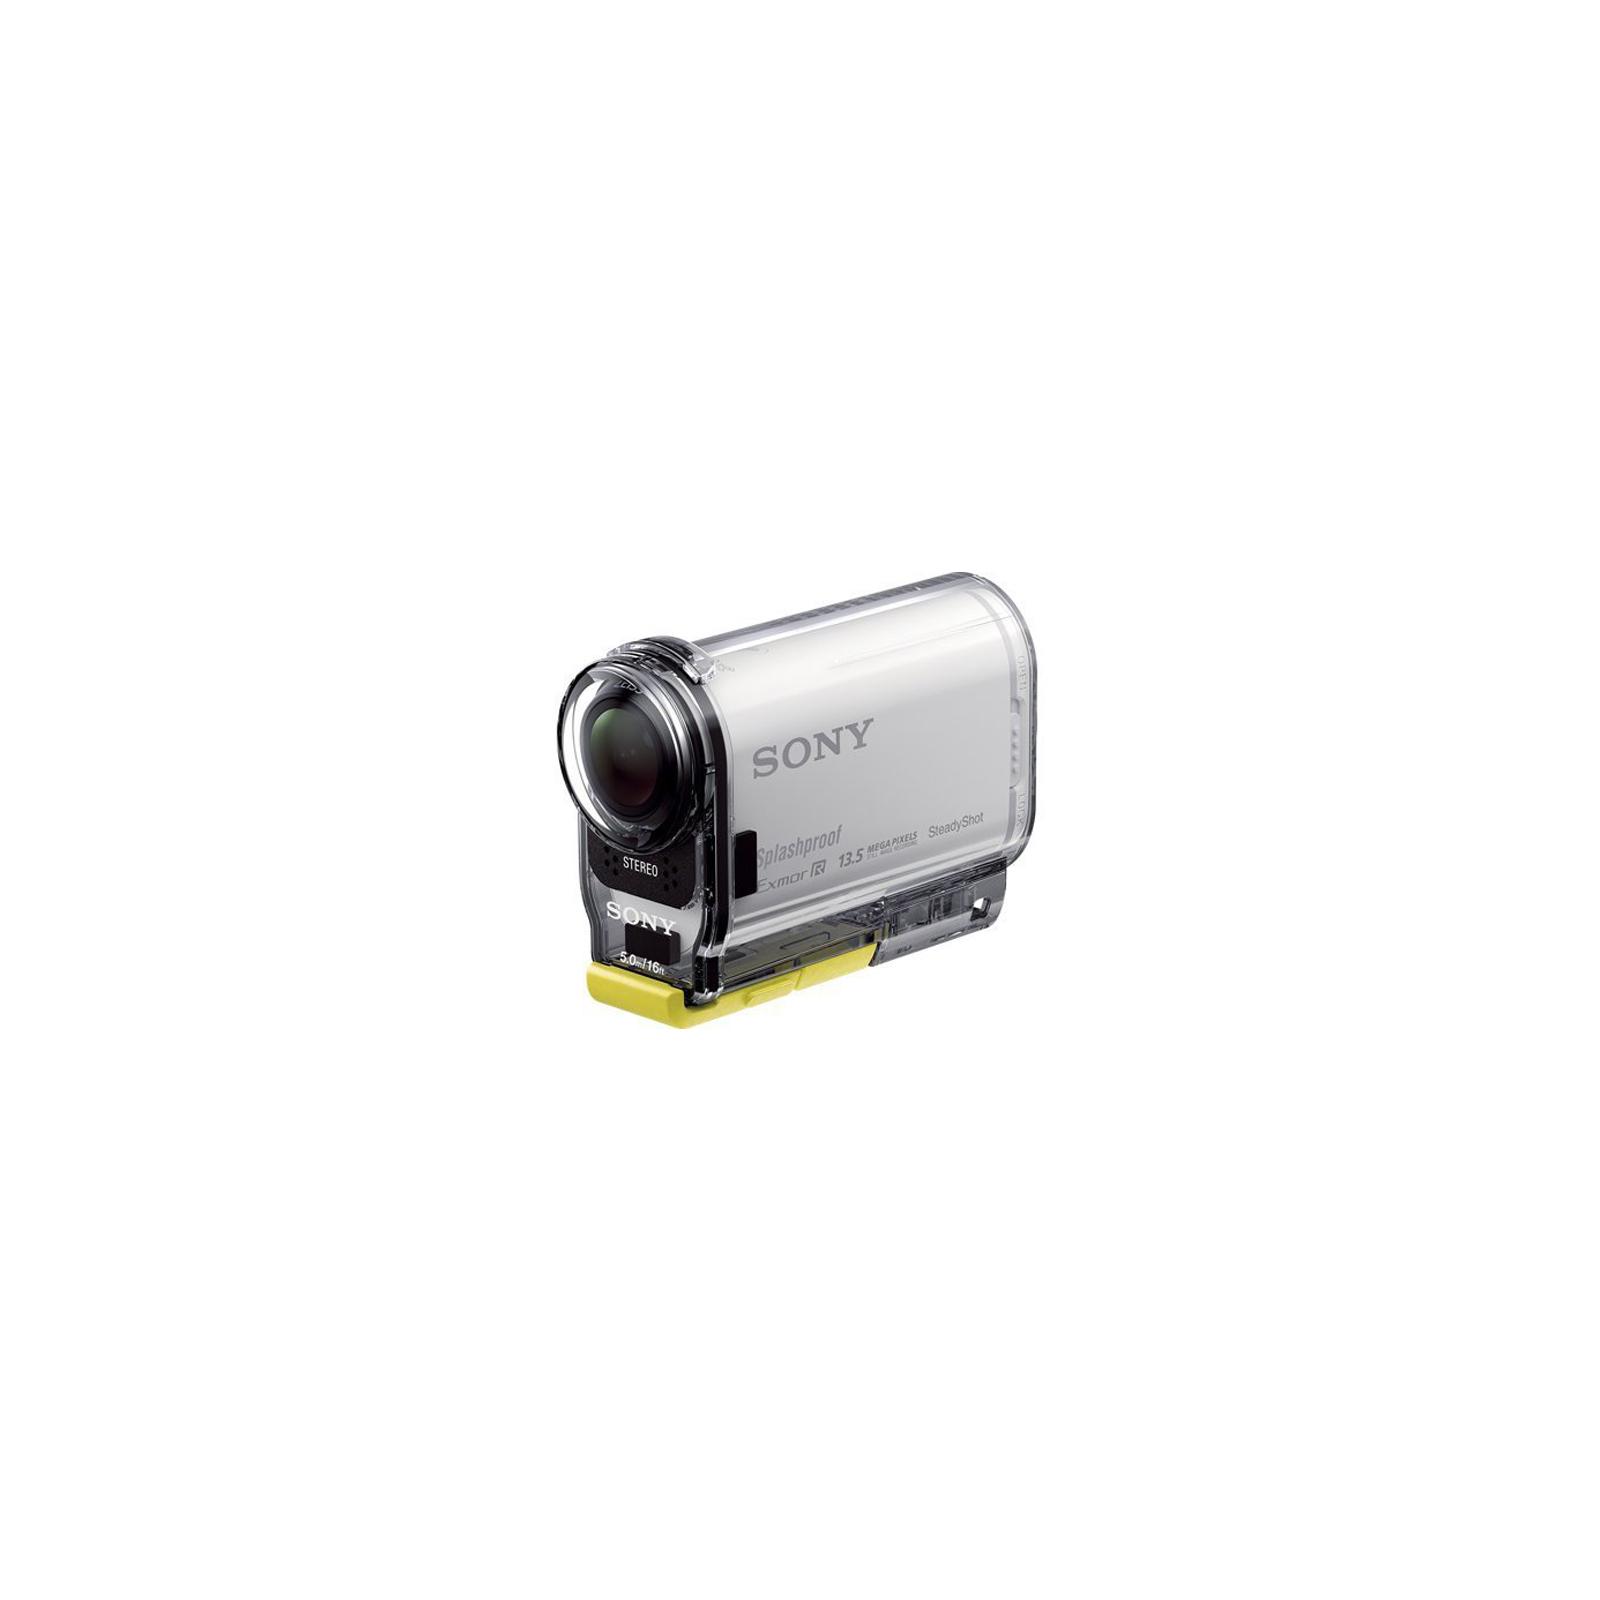 Экшн-камера SONY HDR-AS100V w/RM-LVR1 (HDRAS100VR.CEN) изображение 2